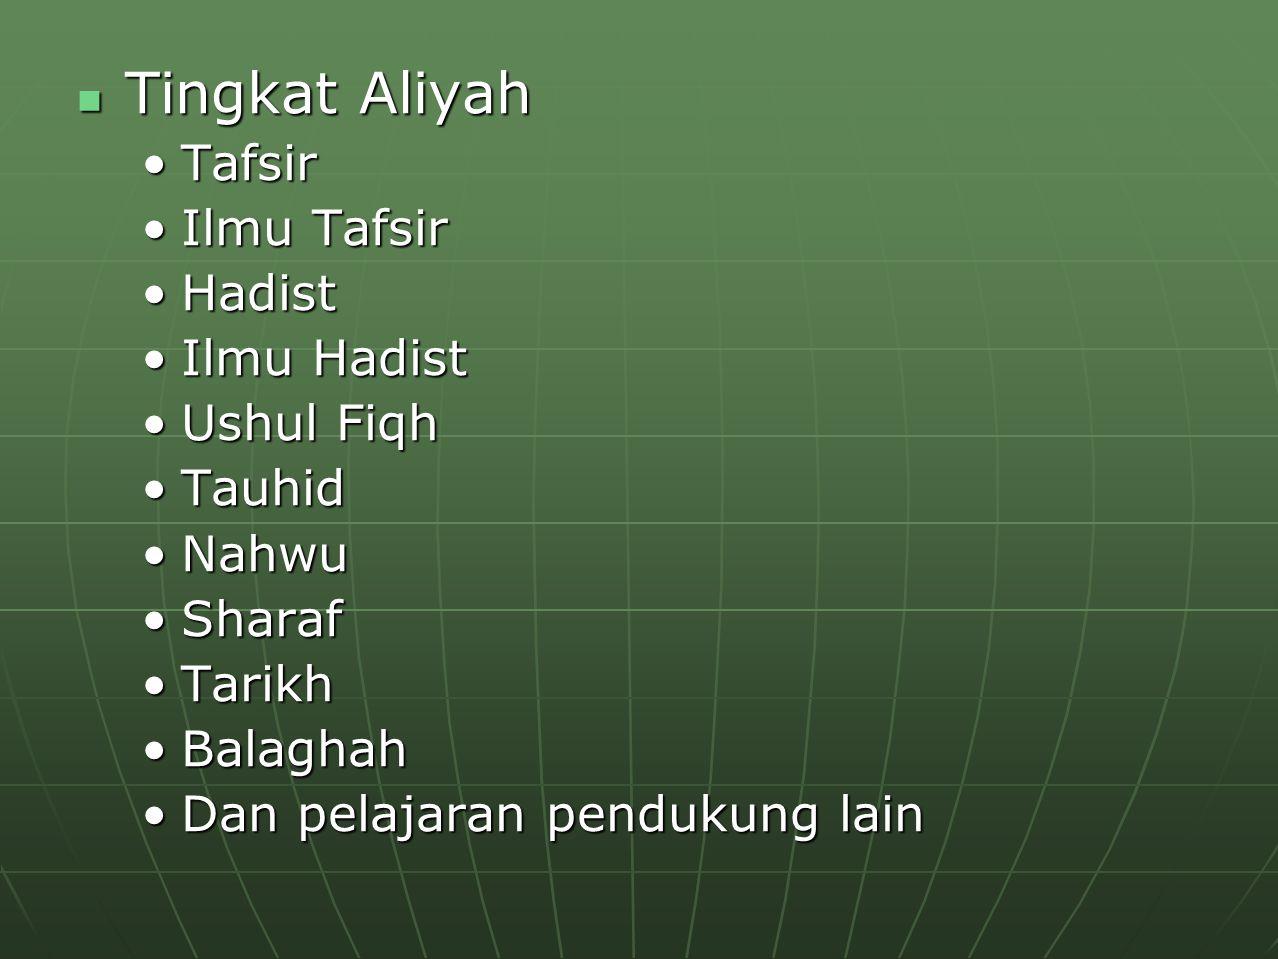 Tingkat Aliyah Tingkat Aliyah TafsirTafsir Ilmu TafsirIlmu Tafsir HadistHadist Ilmu HadistIlmu Hadist Ushul FiqhUshul Fiqh TauhidTauhid NahwuNahwu Sha